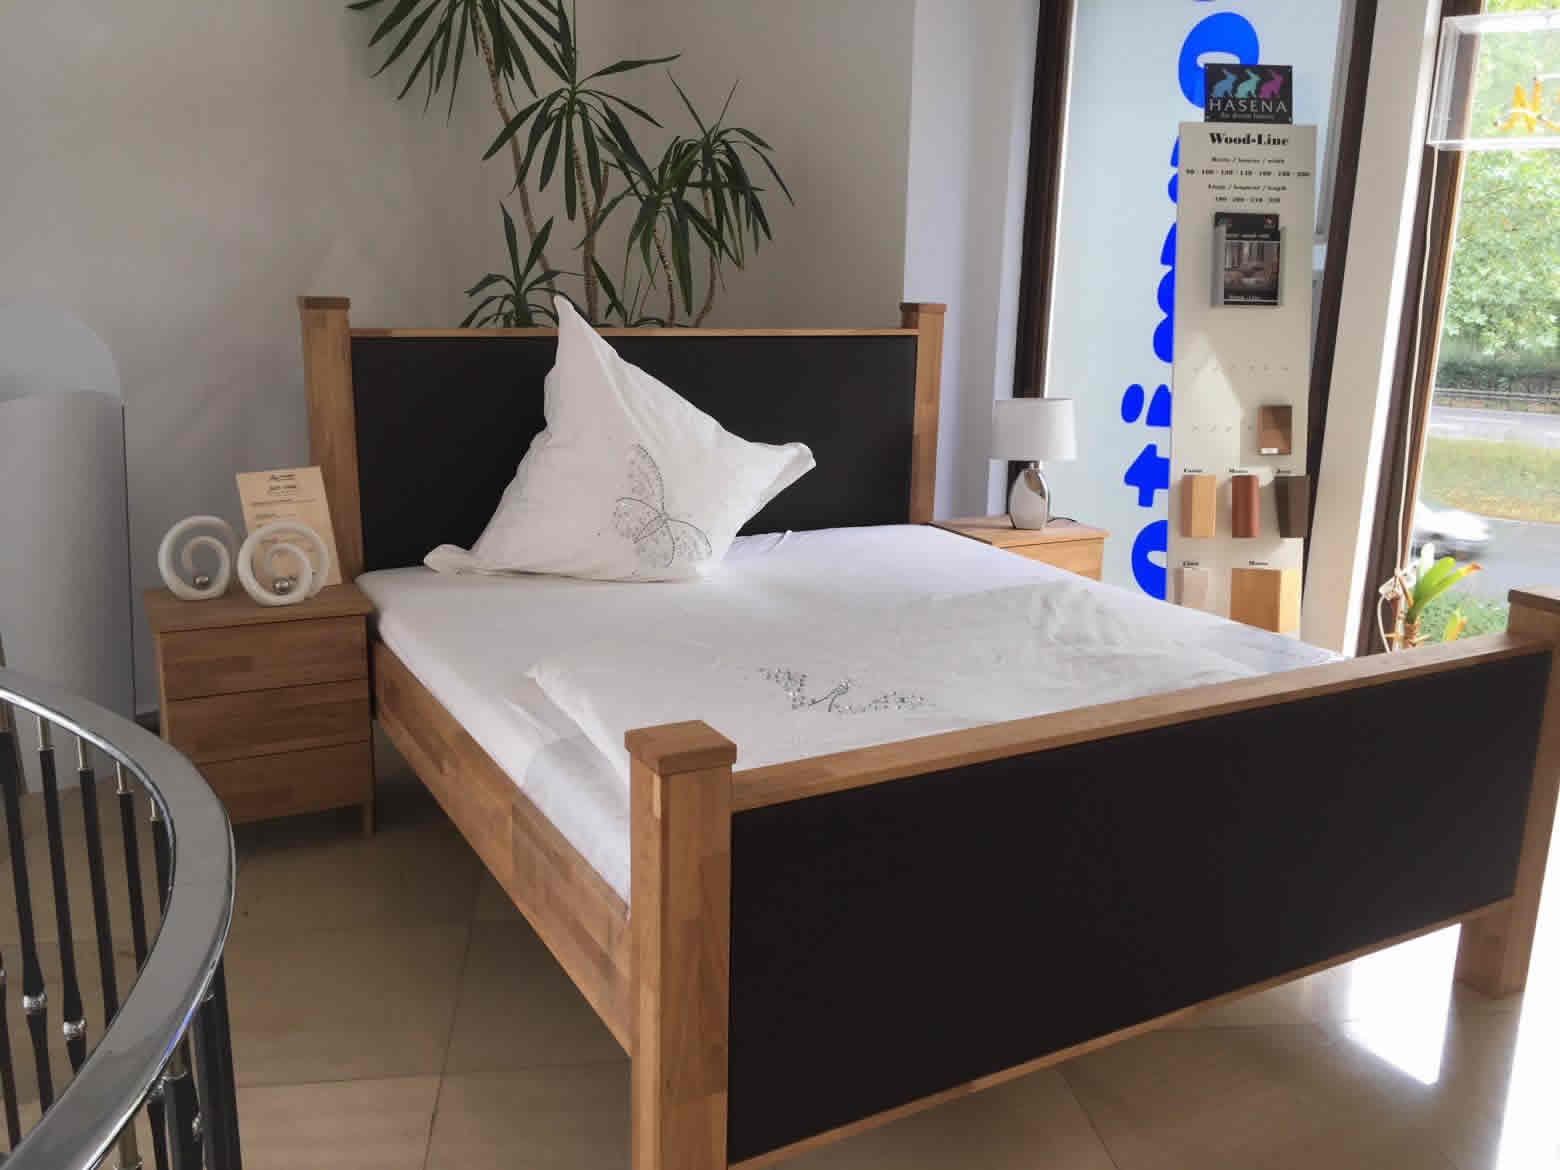 bettrahmen und gestelle dormito matratzen boxspringbetten. Black Bedroom Furniture Sets. Home Design Ideas